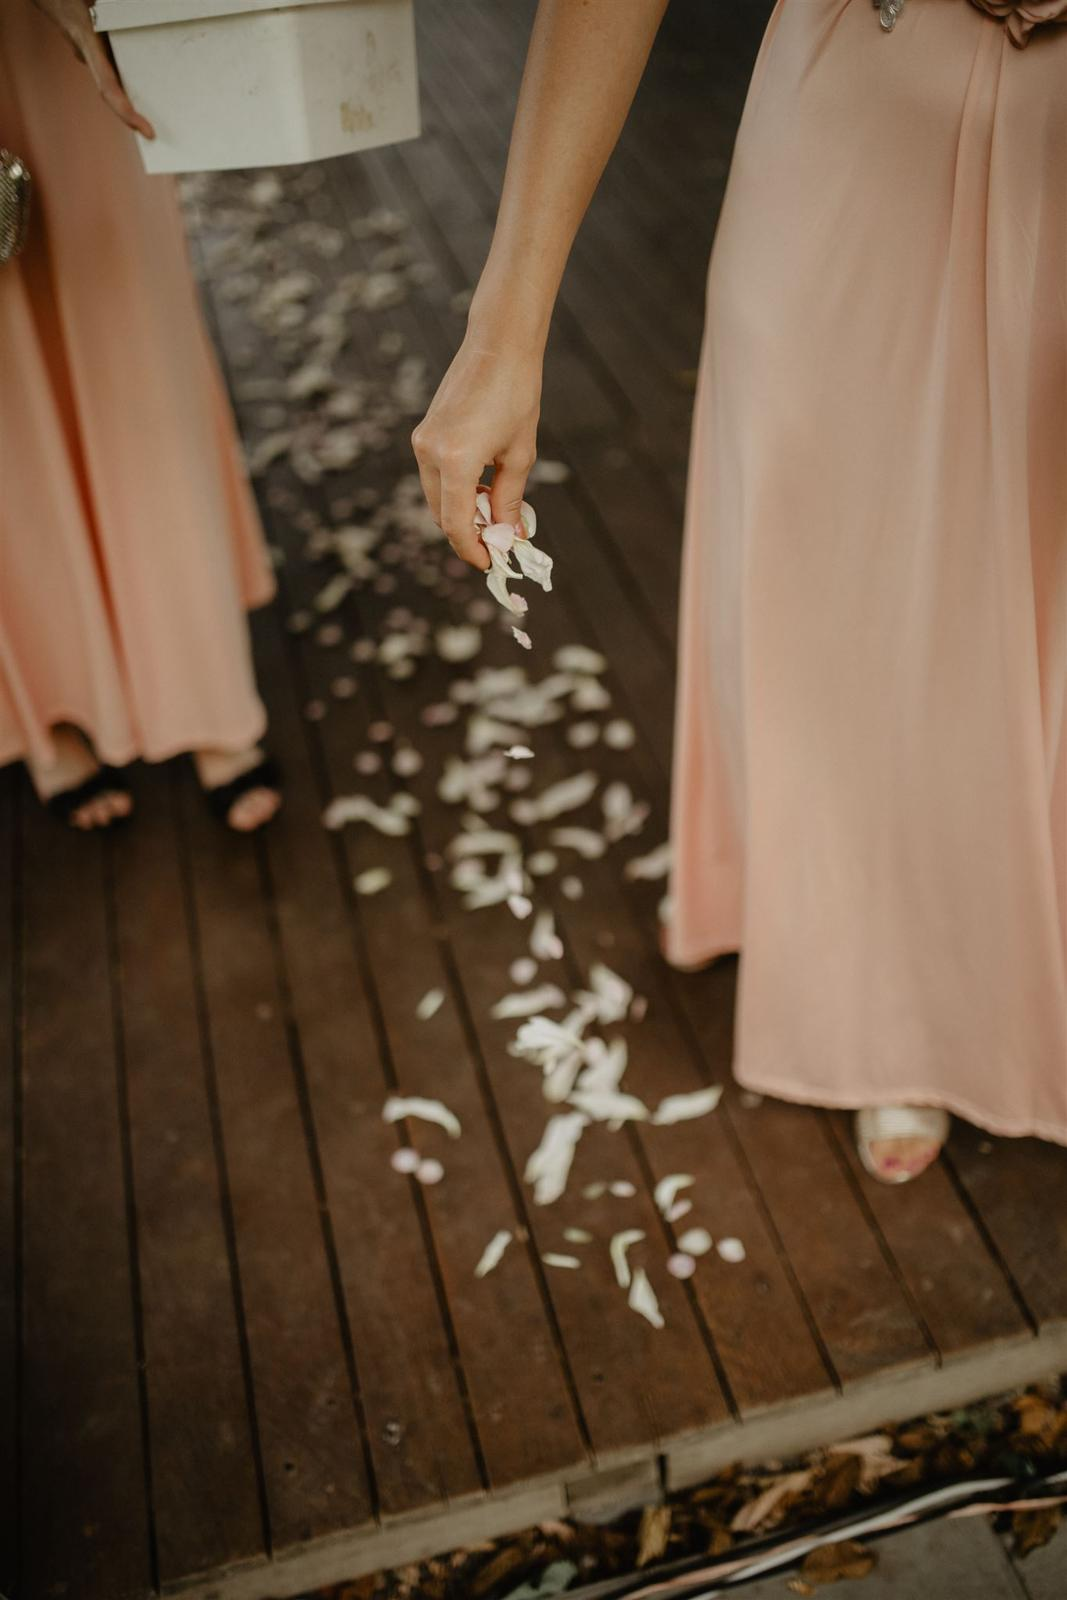 Krásna a romantická svadobná party v záhrade reštaurácie Bistra Dukát - Le Gout v srdci B. Bystrice. - Obrázok č. 13